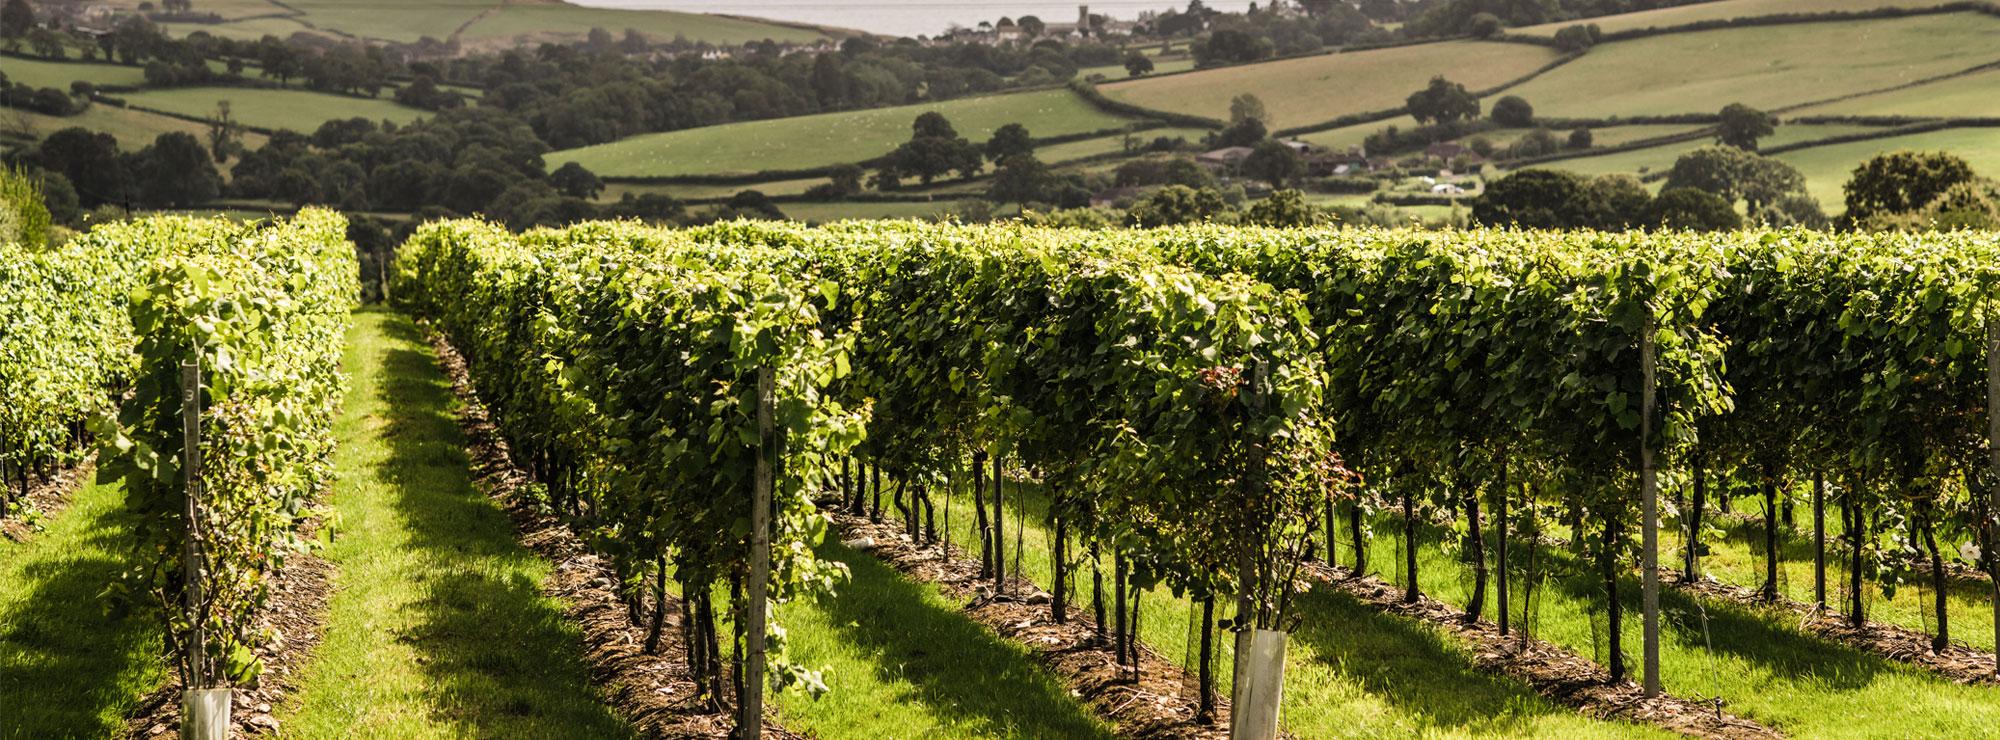 lyme bay vineyard